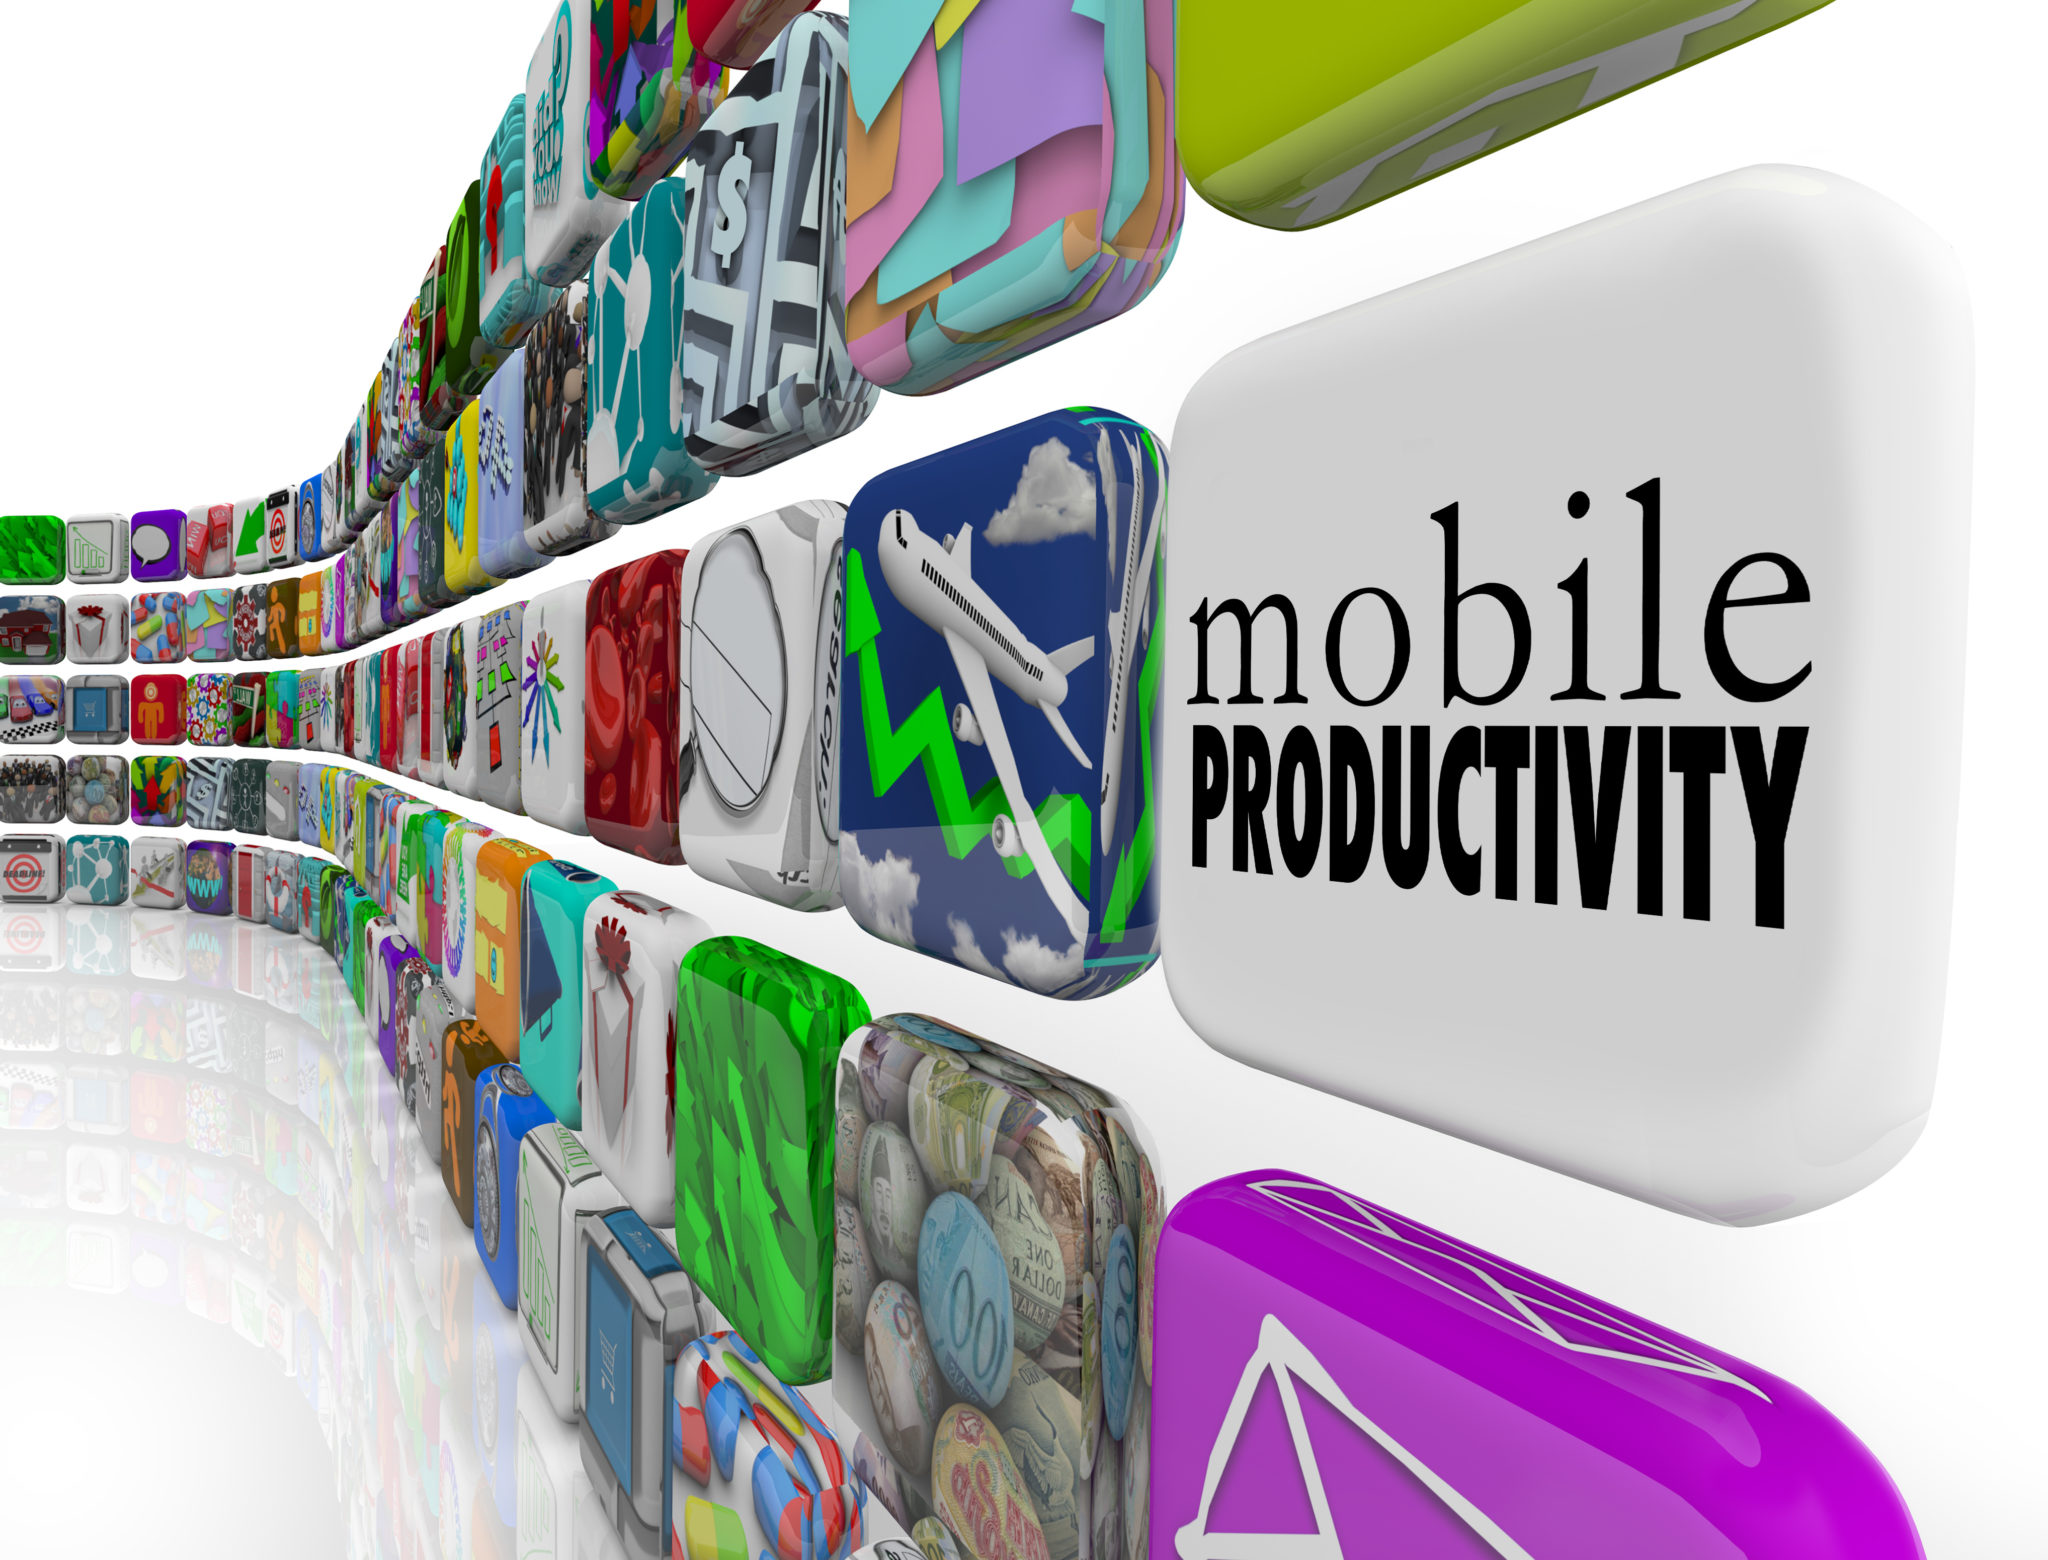 Mobiele productiviteit